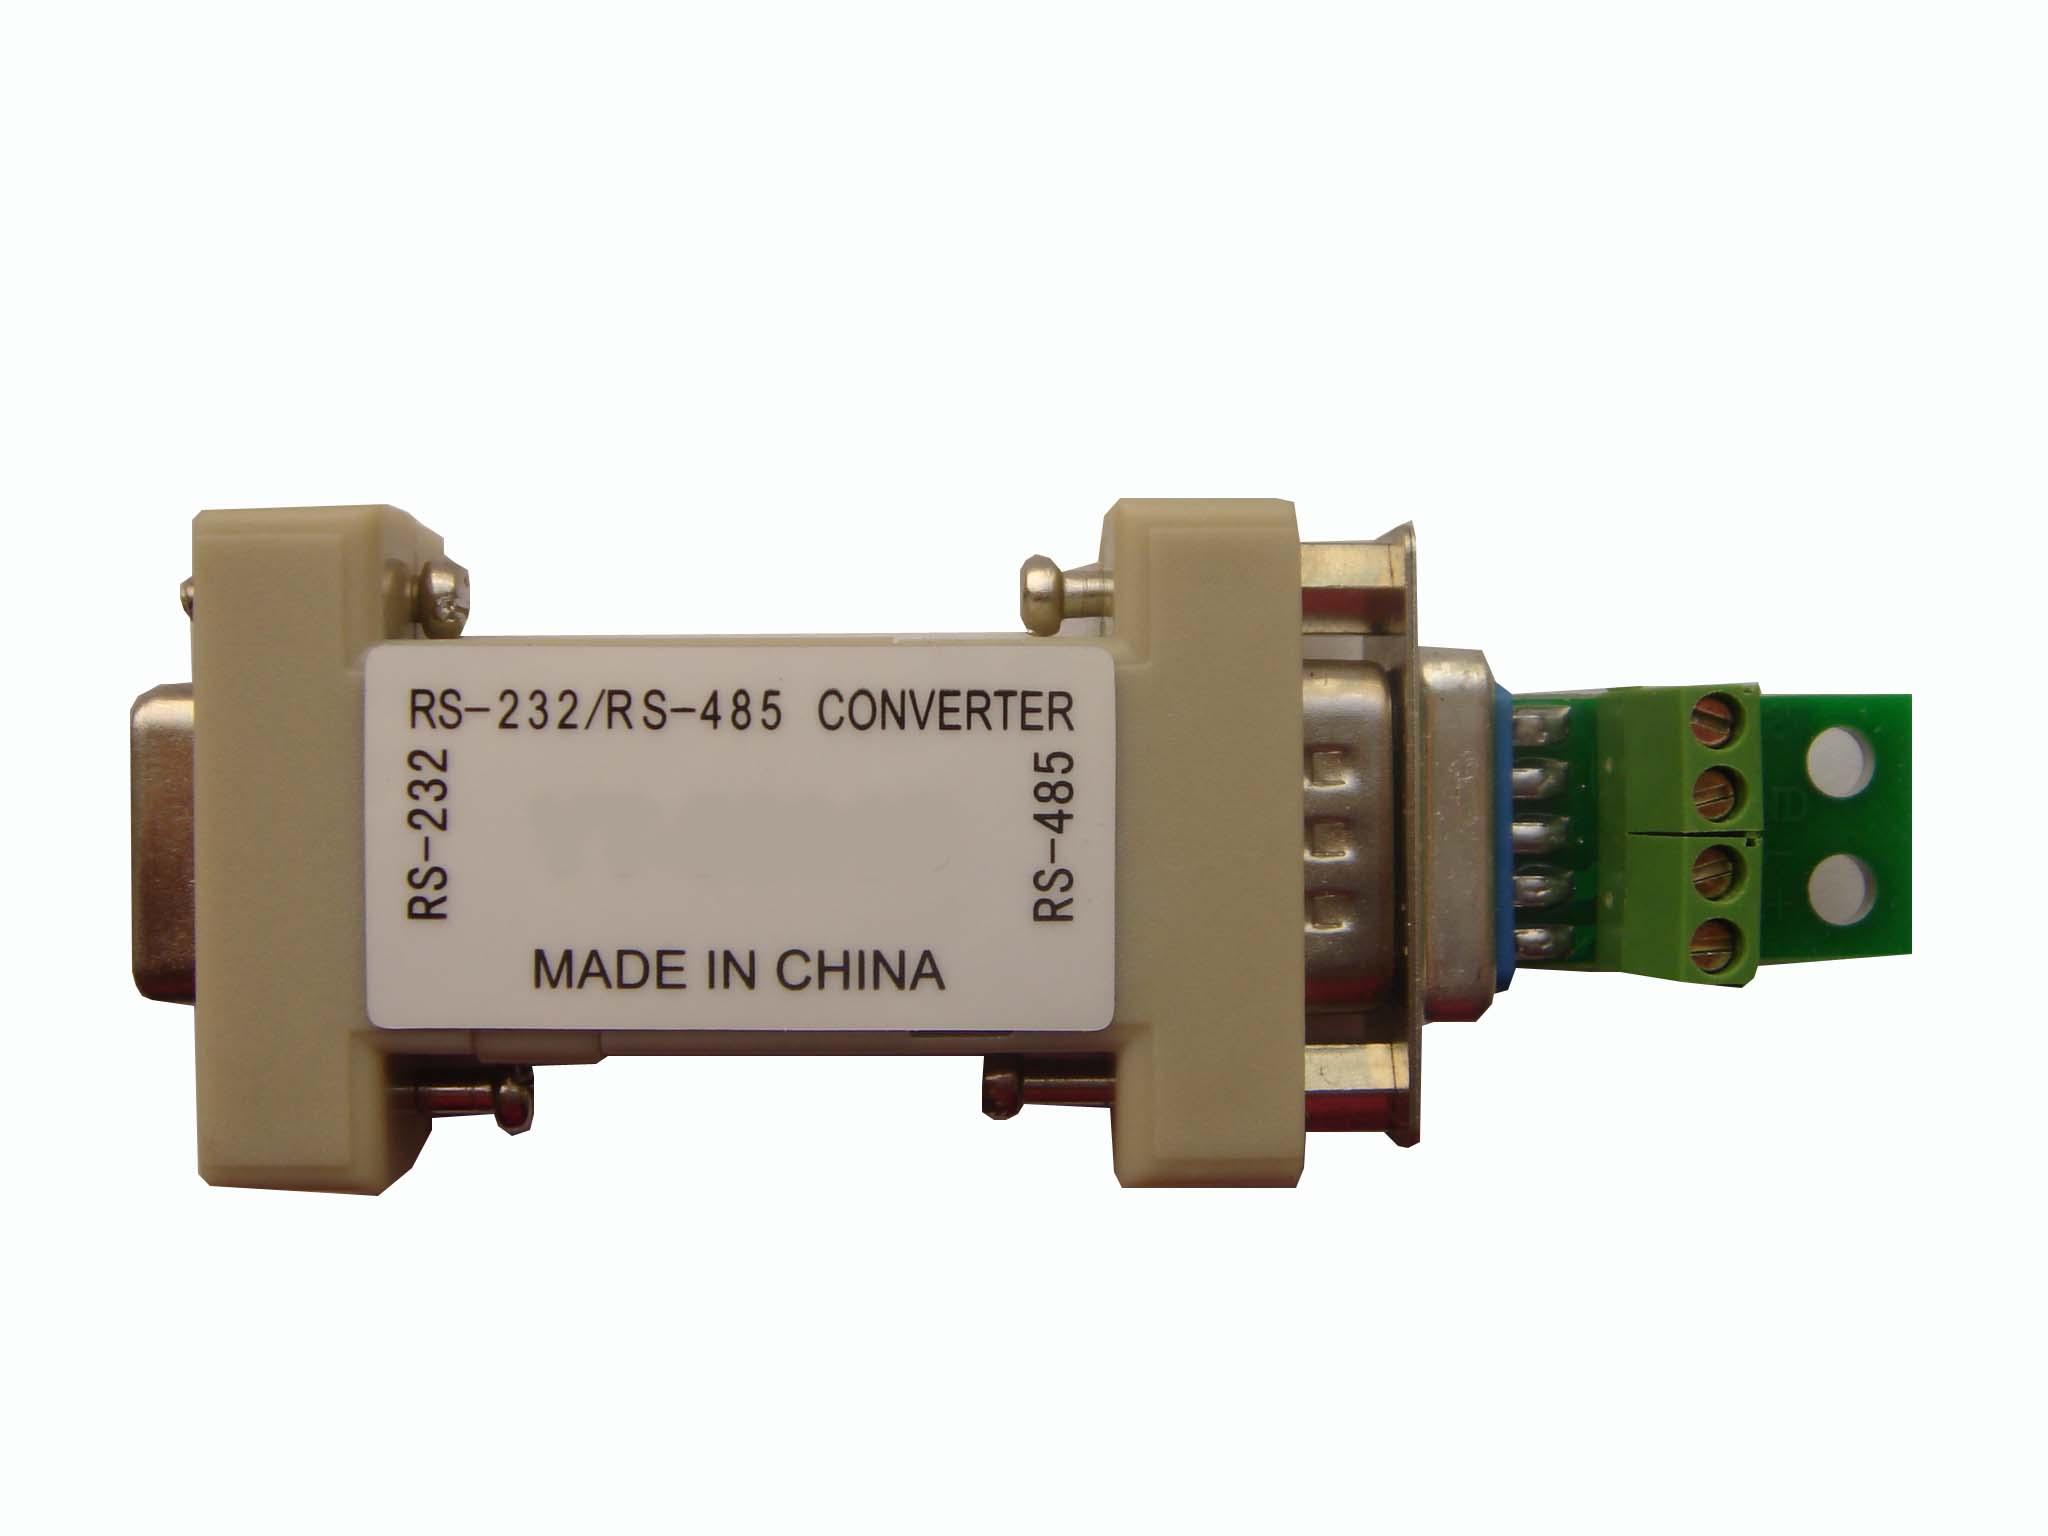 rs 232 to 485 converter circuit diagram 2008 saab 9 3 radio wiring rs232 rs485 bossgoo